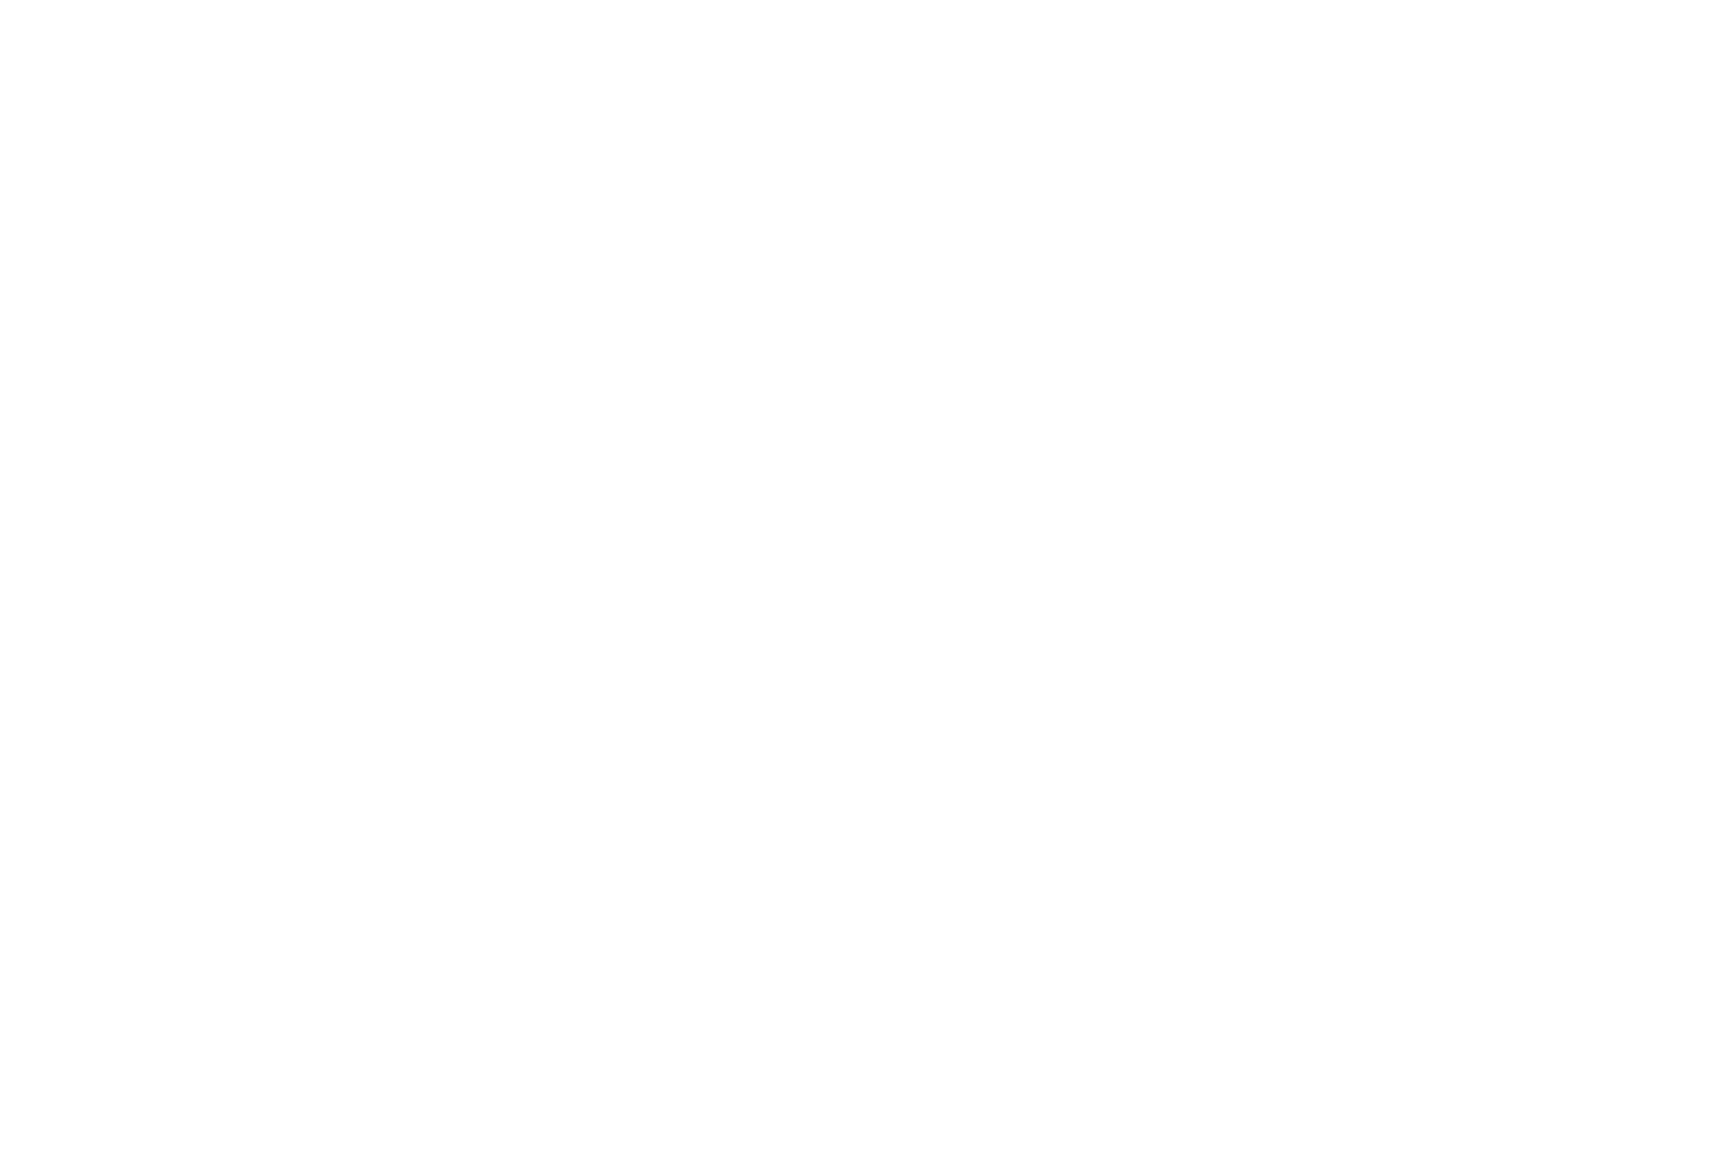 WINNER - BEST FIRST TIME DIRECTOR  - HONOLULU FILM AWARDS 2017.png